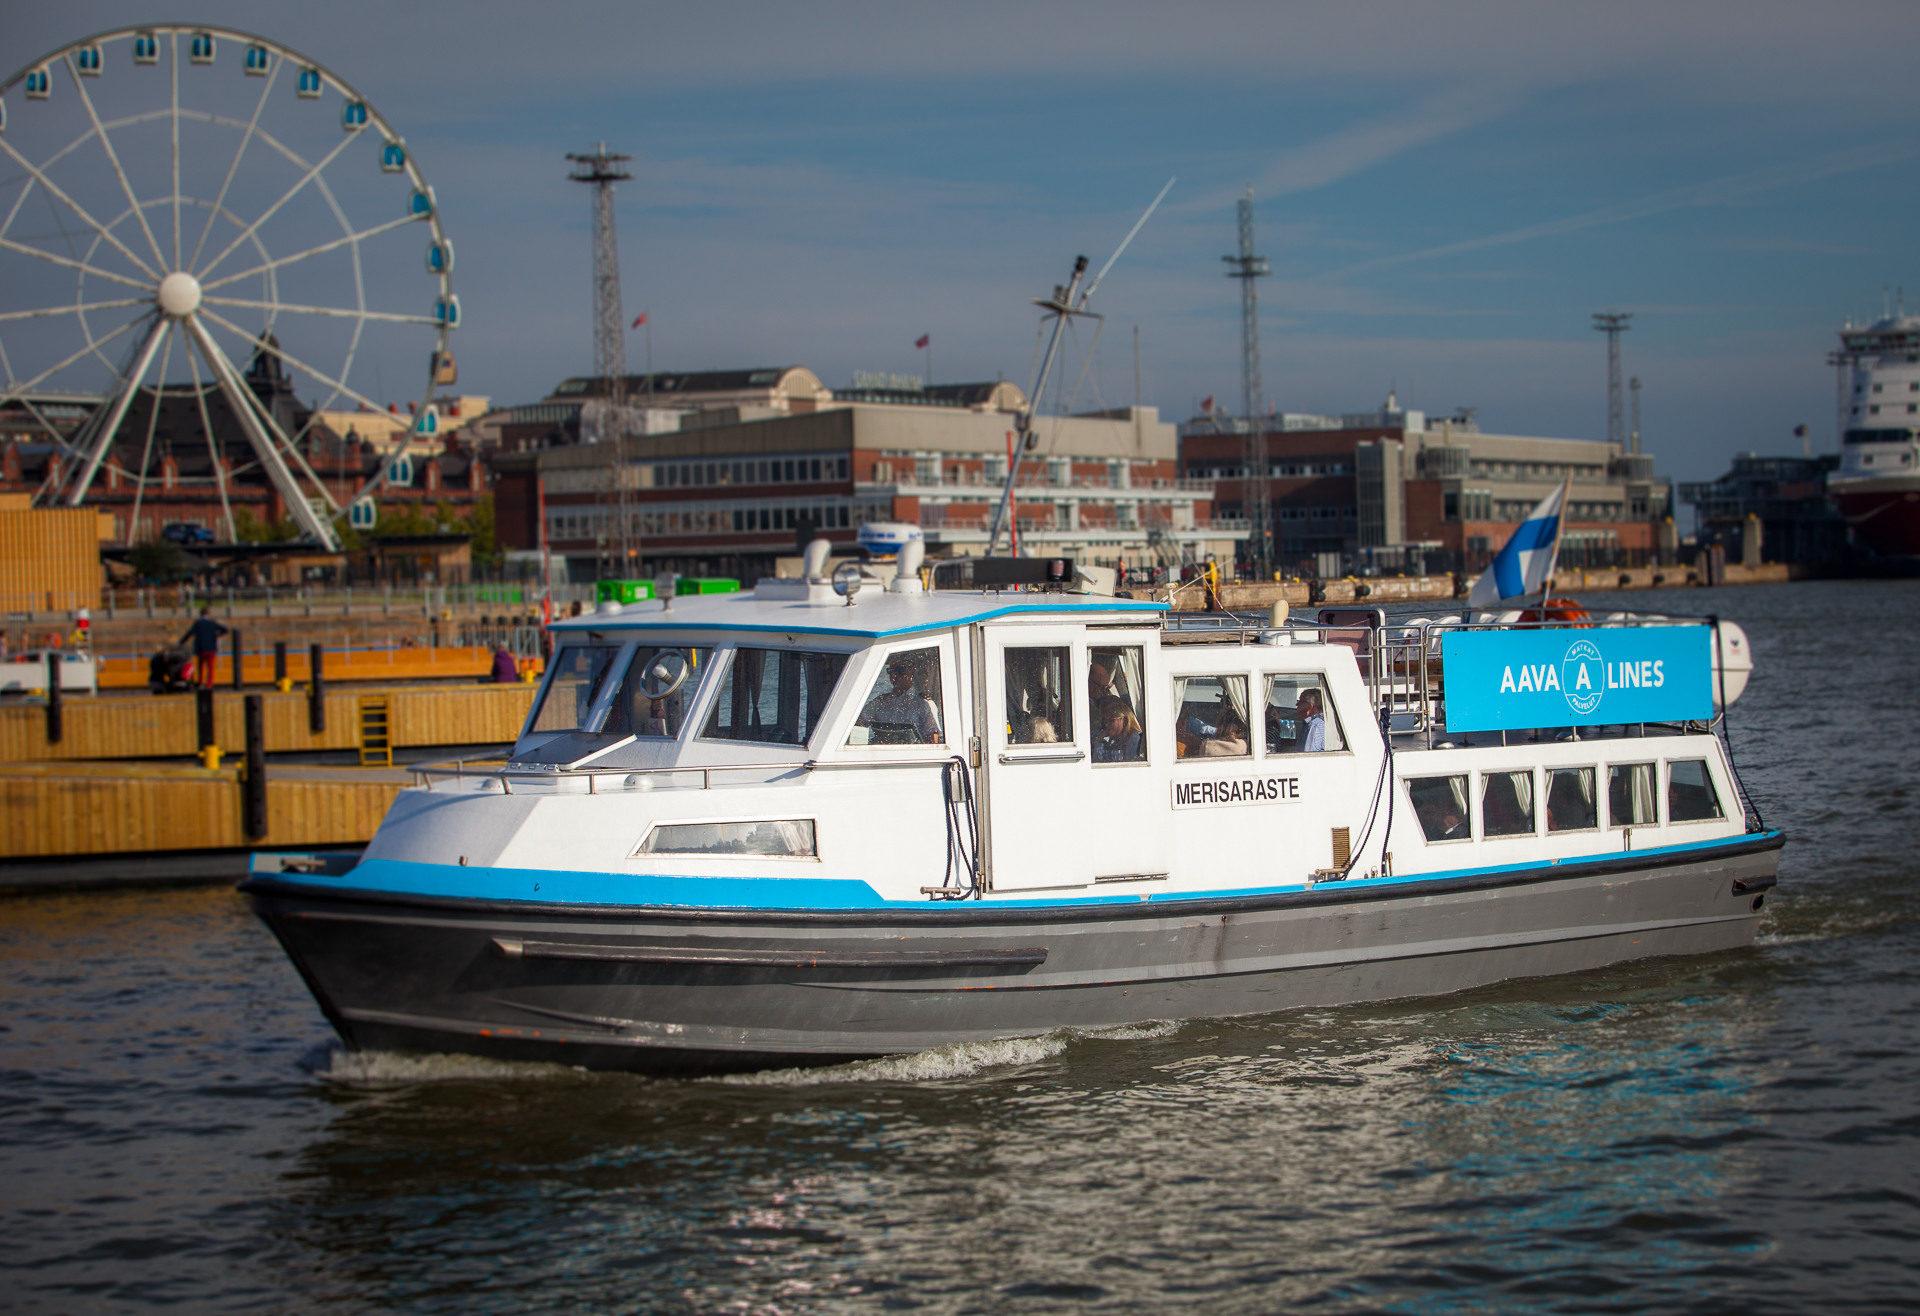 Return transport to Helsinki islands/ restaurants for 1-50 people